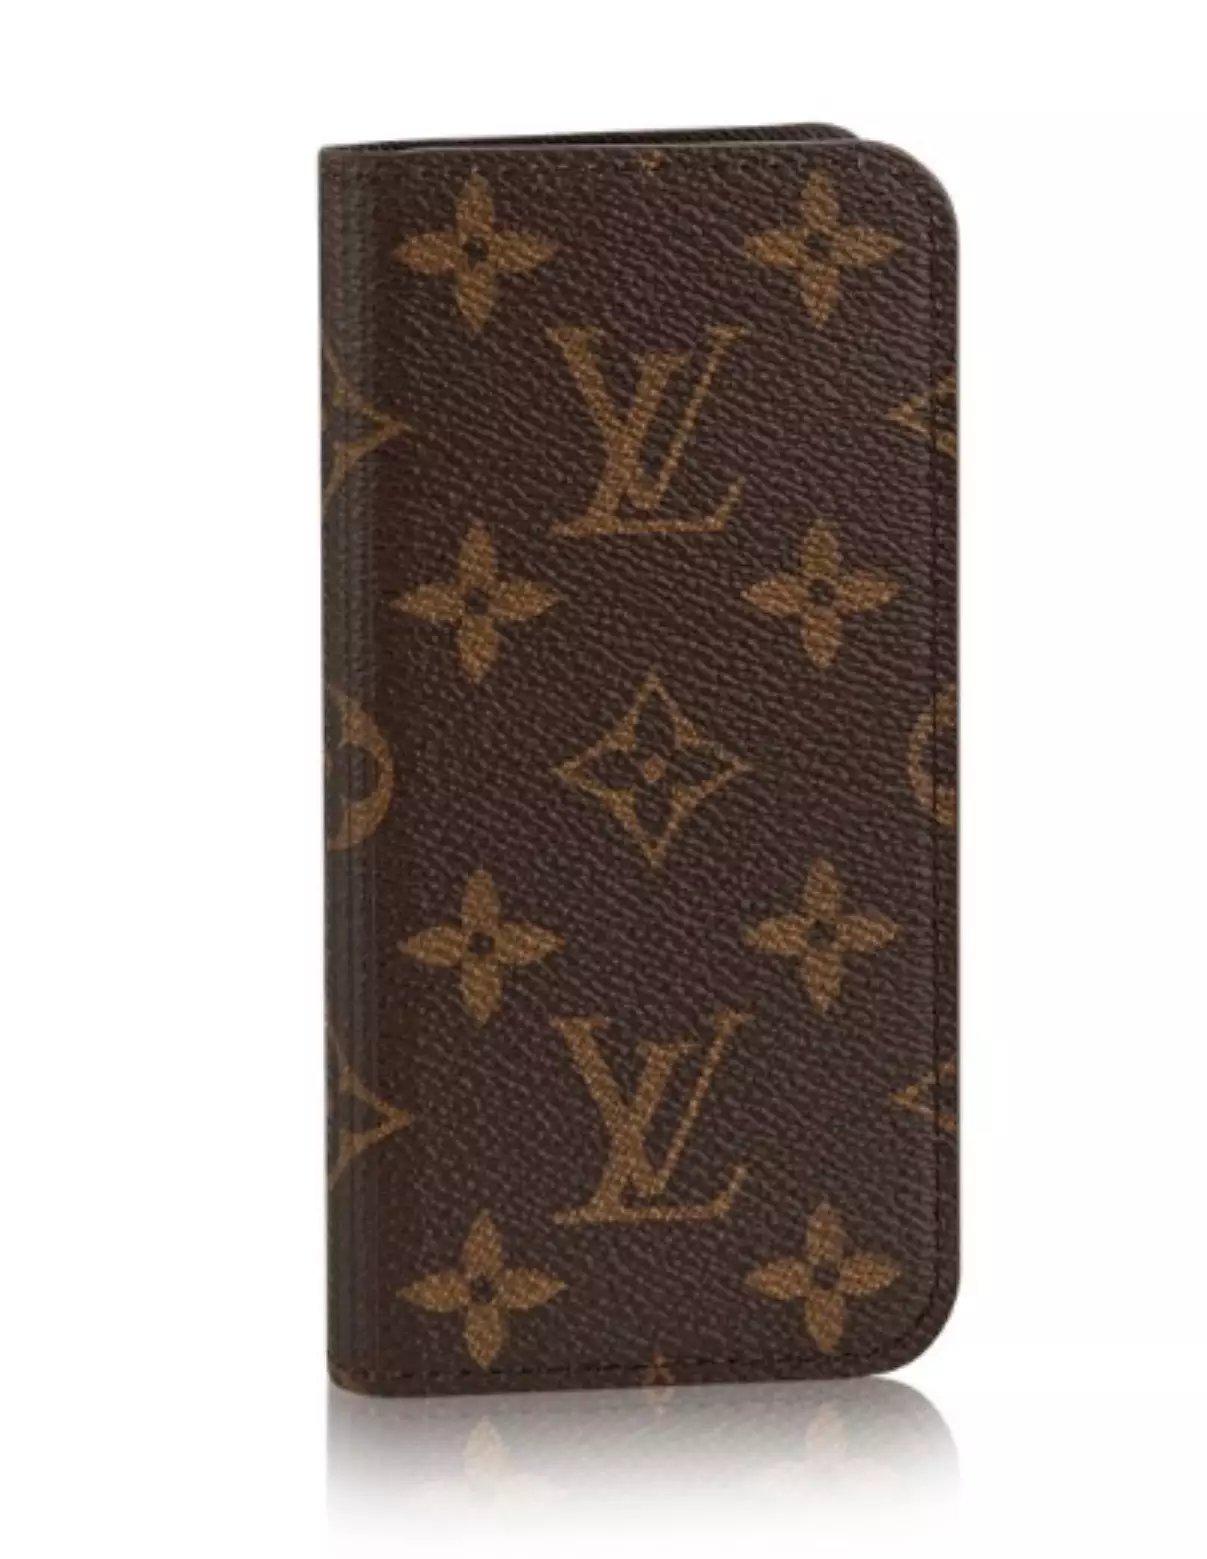 iphone case mit foto iphone hülle leder Louis Vuitton iphone6 hülle die coolsten iphone hüllen handy cover iphone 6 6lbst gestalten iphone 6 a6 gestalten iphone 6 hülle 6lbst gestalten iphone 6 hülle bedrucken apple iphone 6 schutzhülle